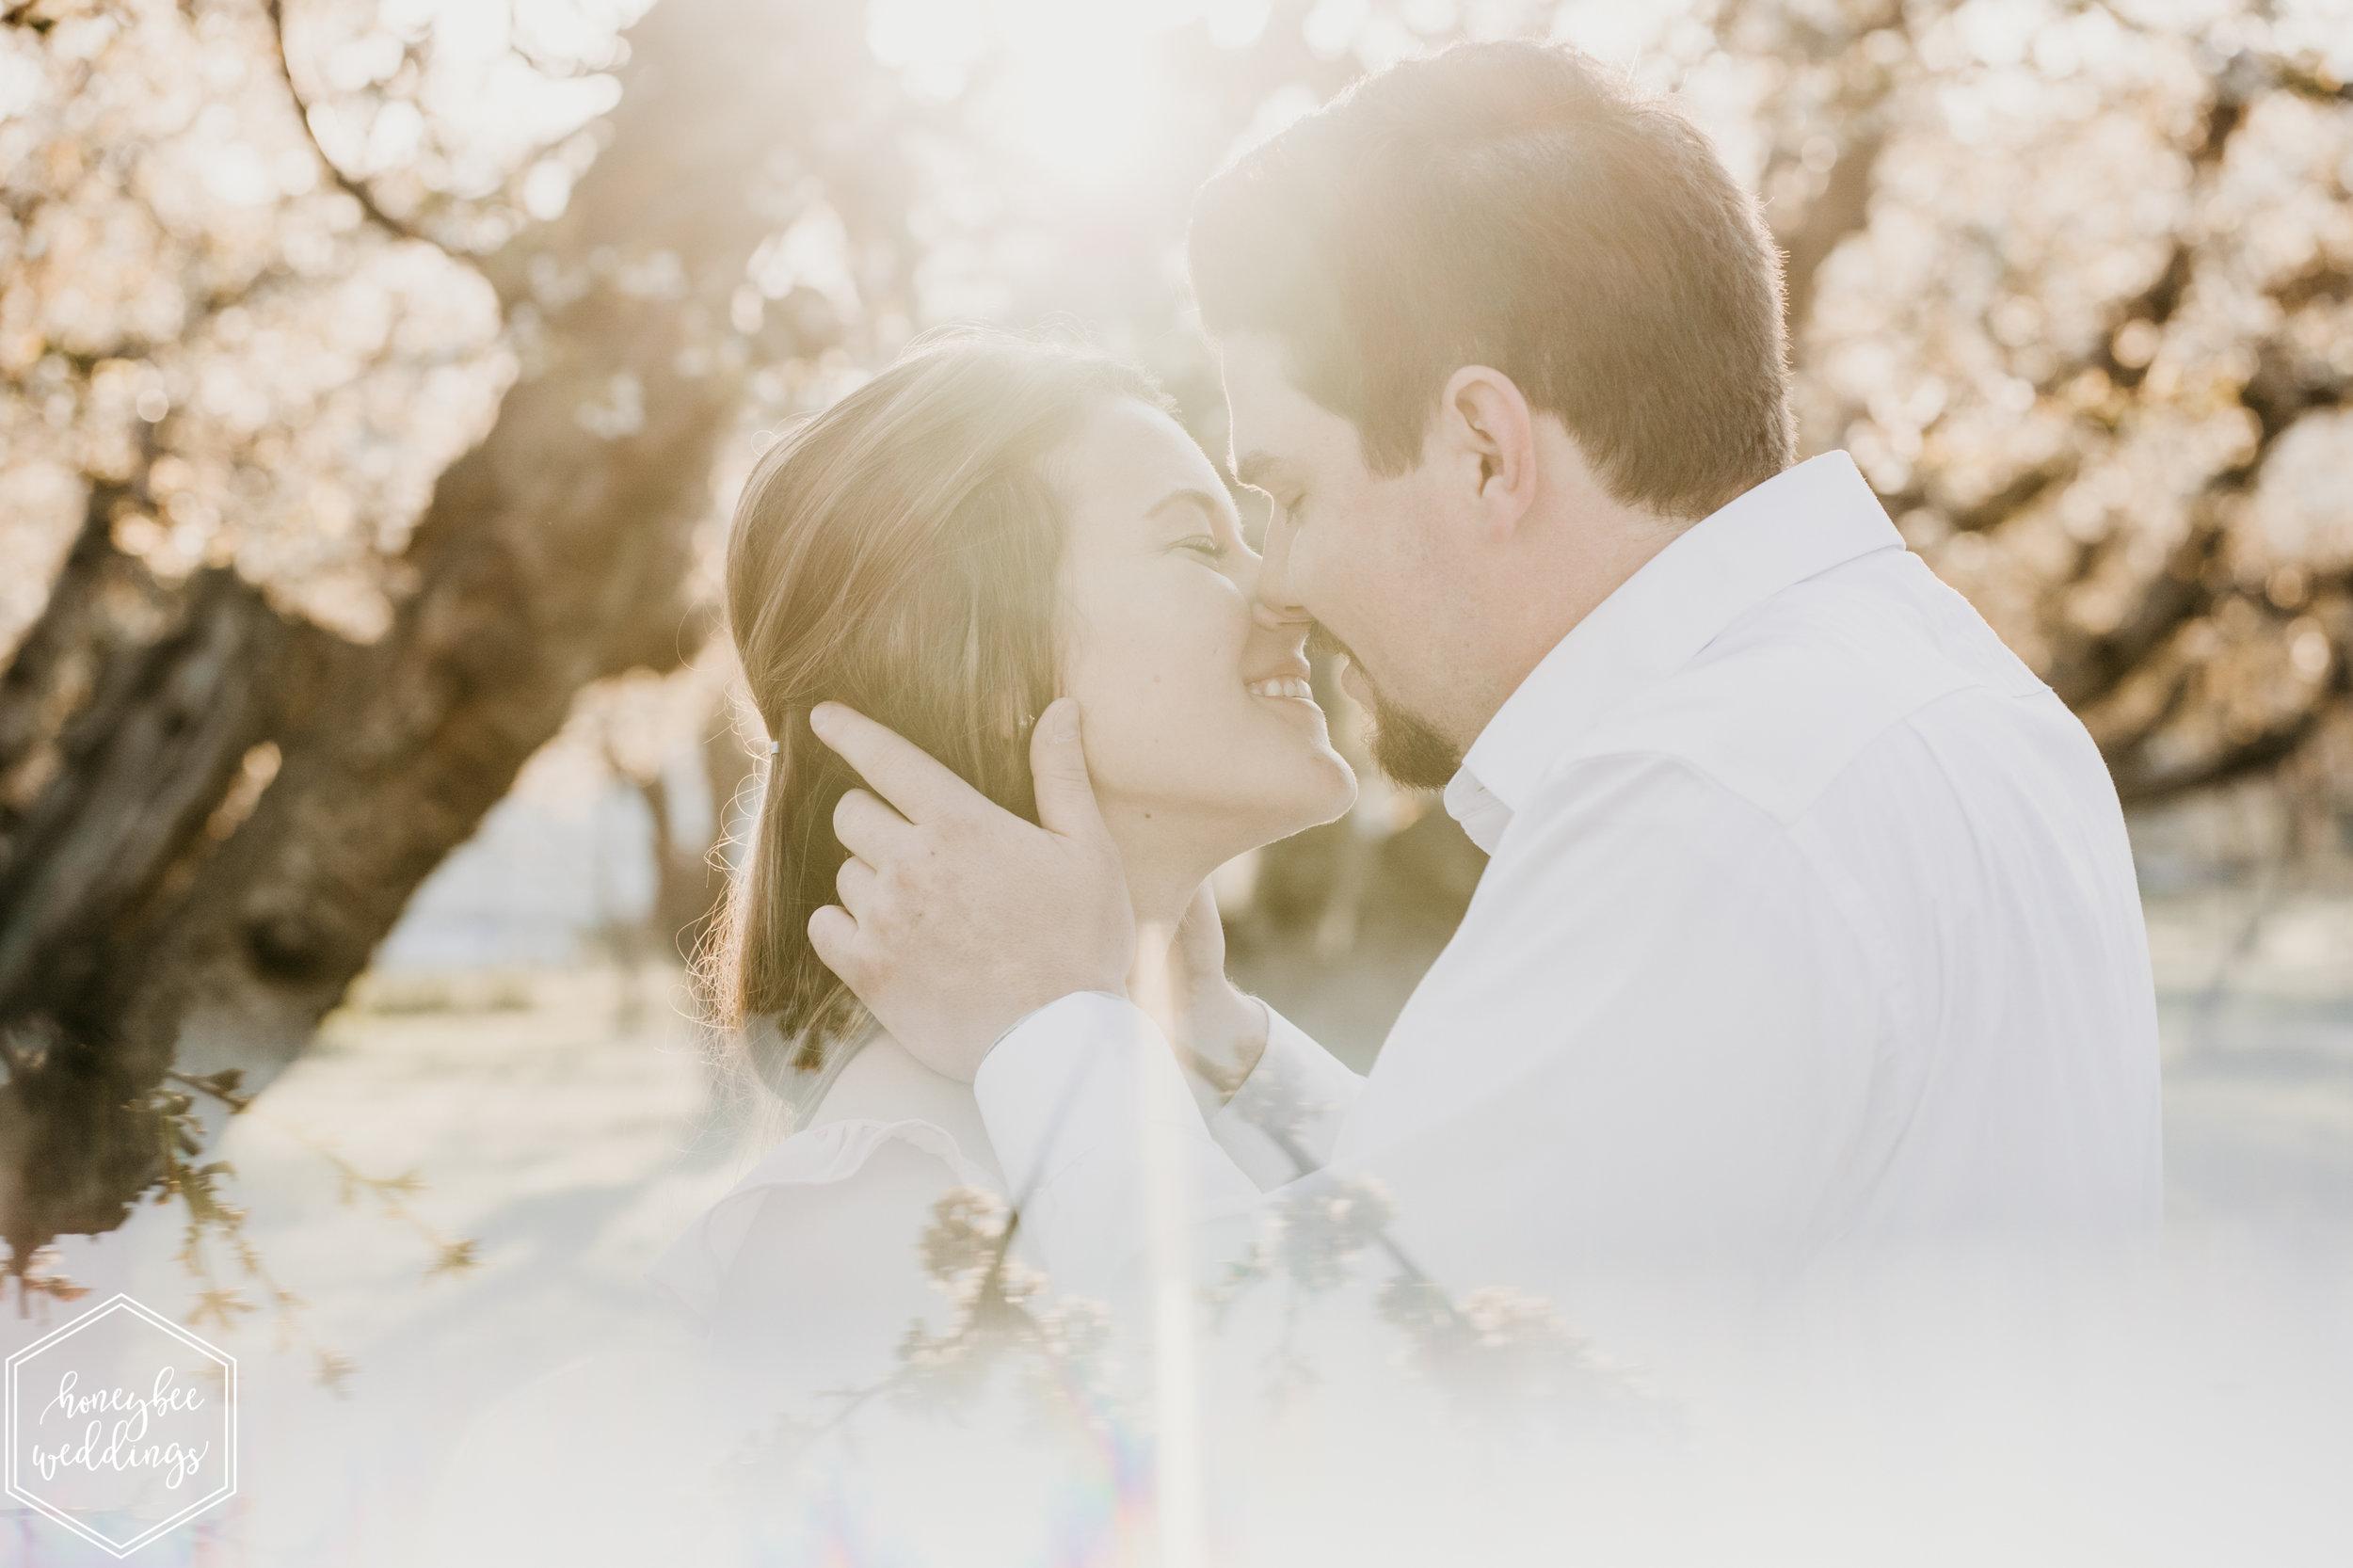 095Montana Wedding Photographer_Cherry Blossom Engagement Session_Ashlin & Luke_Honeybee Weddings_May 11, 2019-297.jpg